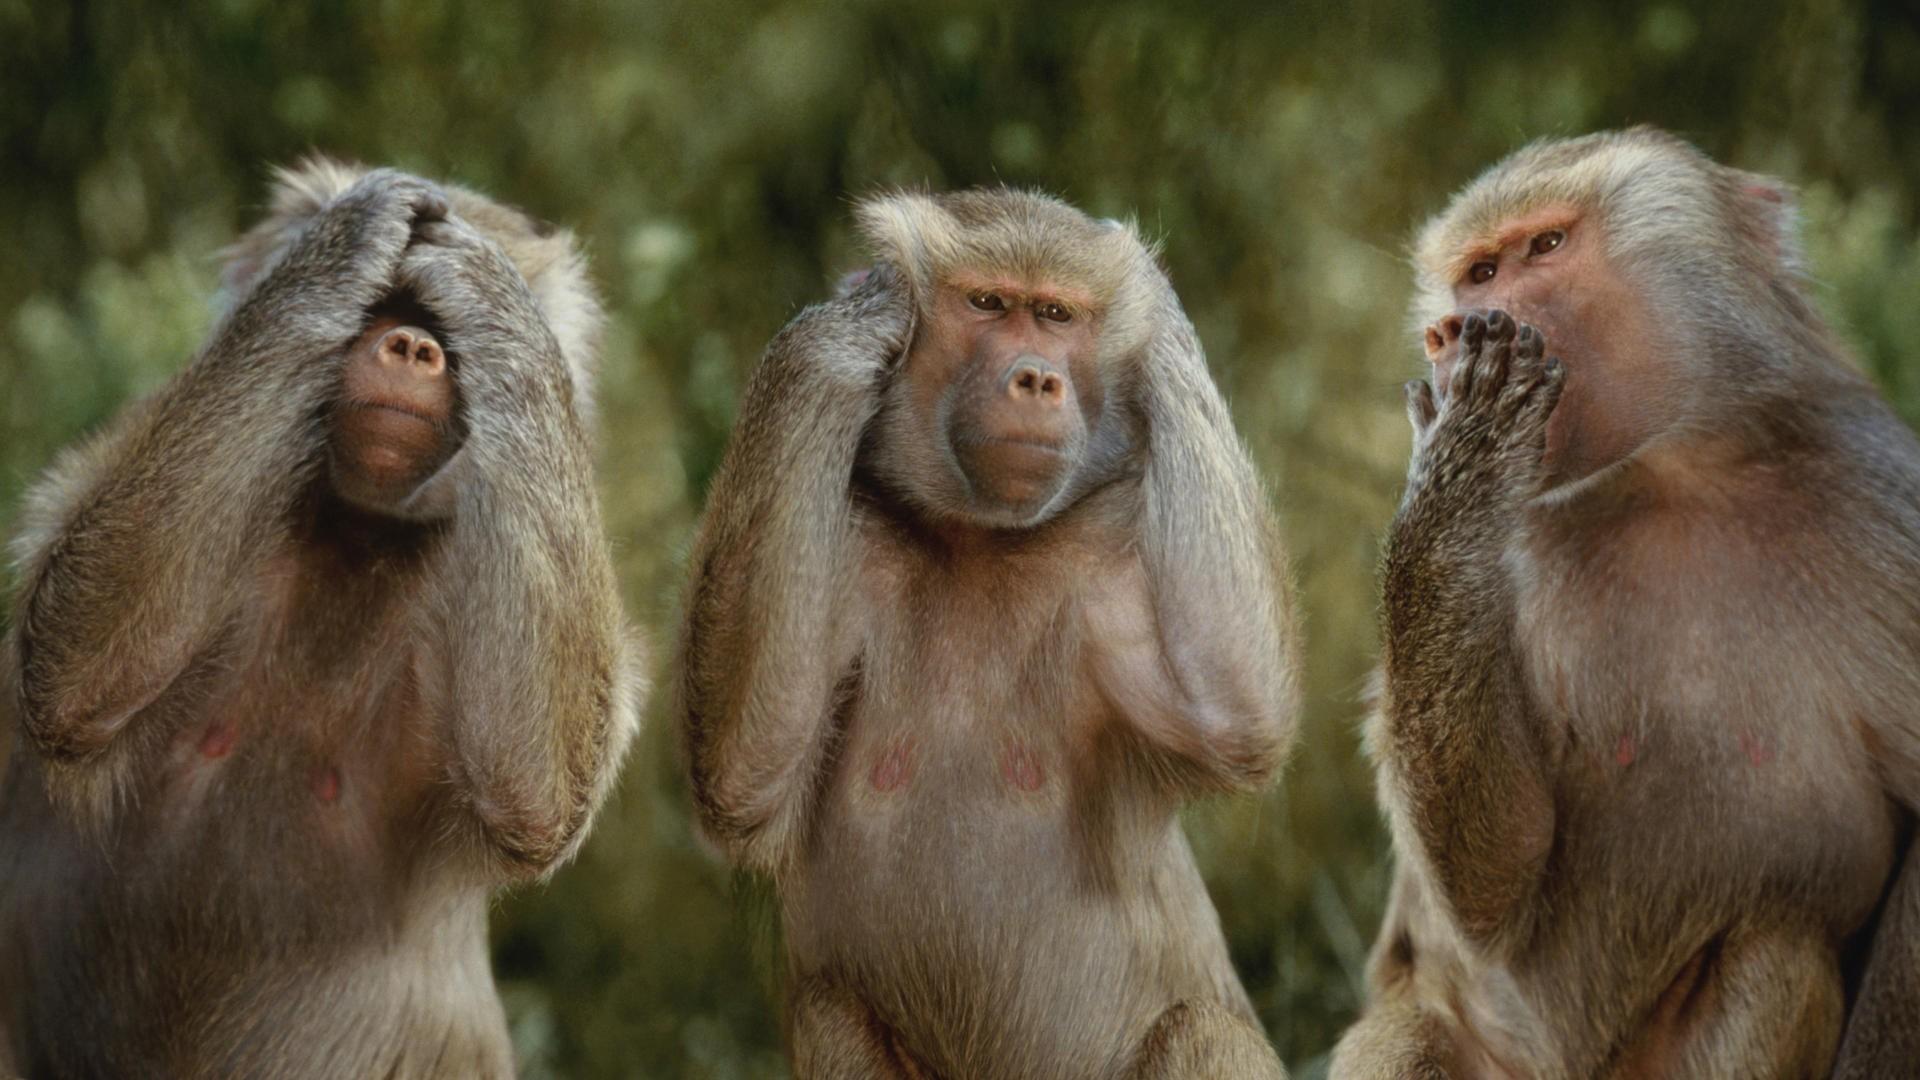 Animal Monkey Wallpaper 1920x1080 Animal Monkey 1920x1080